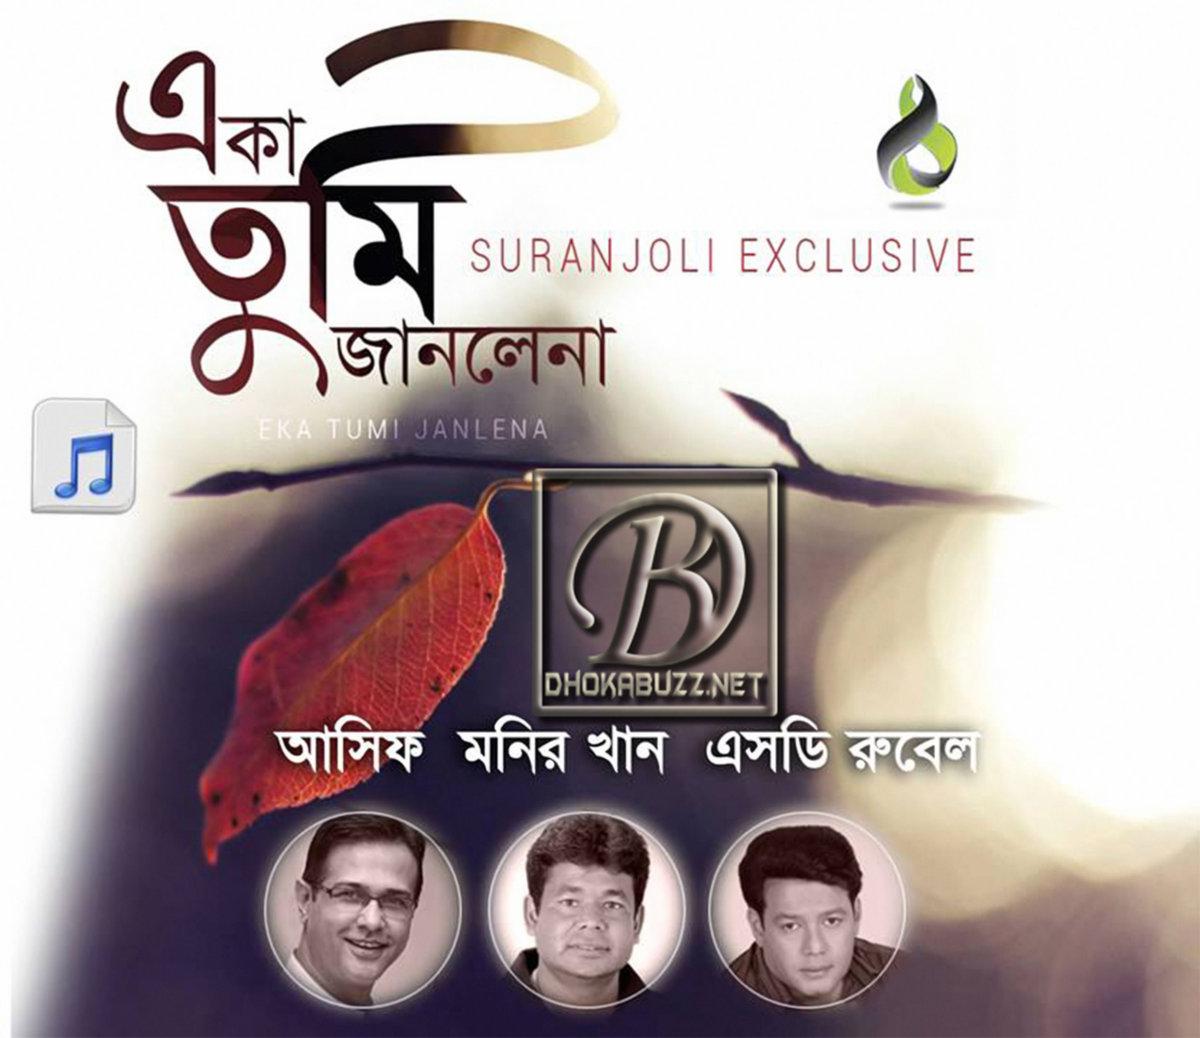 New bengali film awara mp3 song download | slippenting.